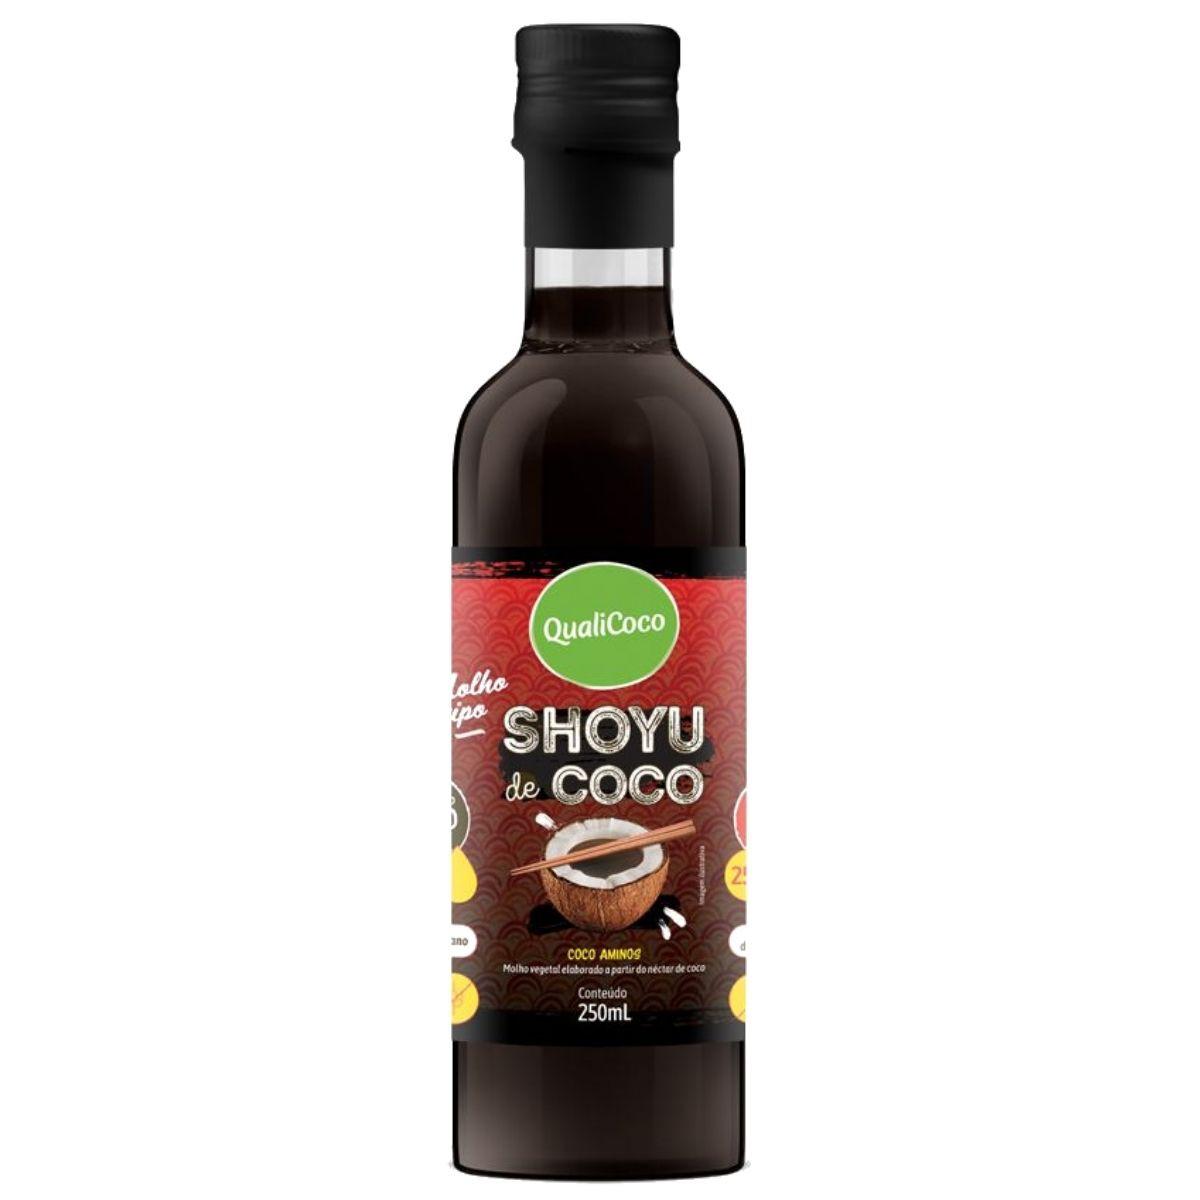 Shoyu de Coco Aminos 100% Natural 250ml - QualiCoco